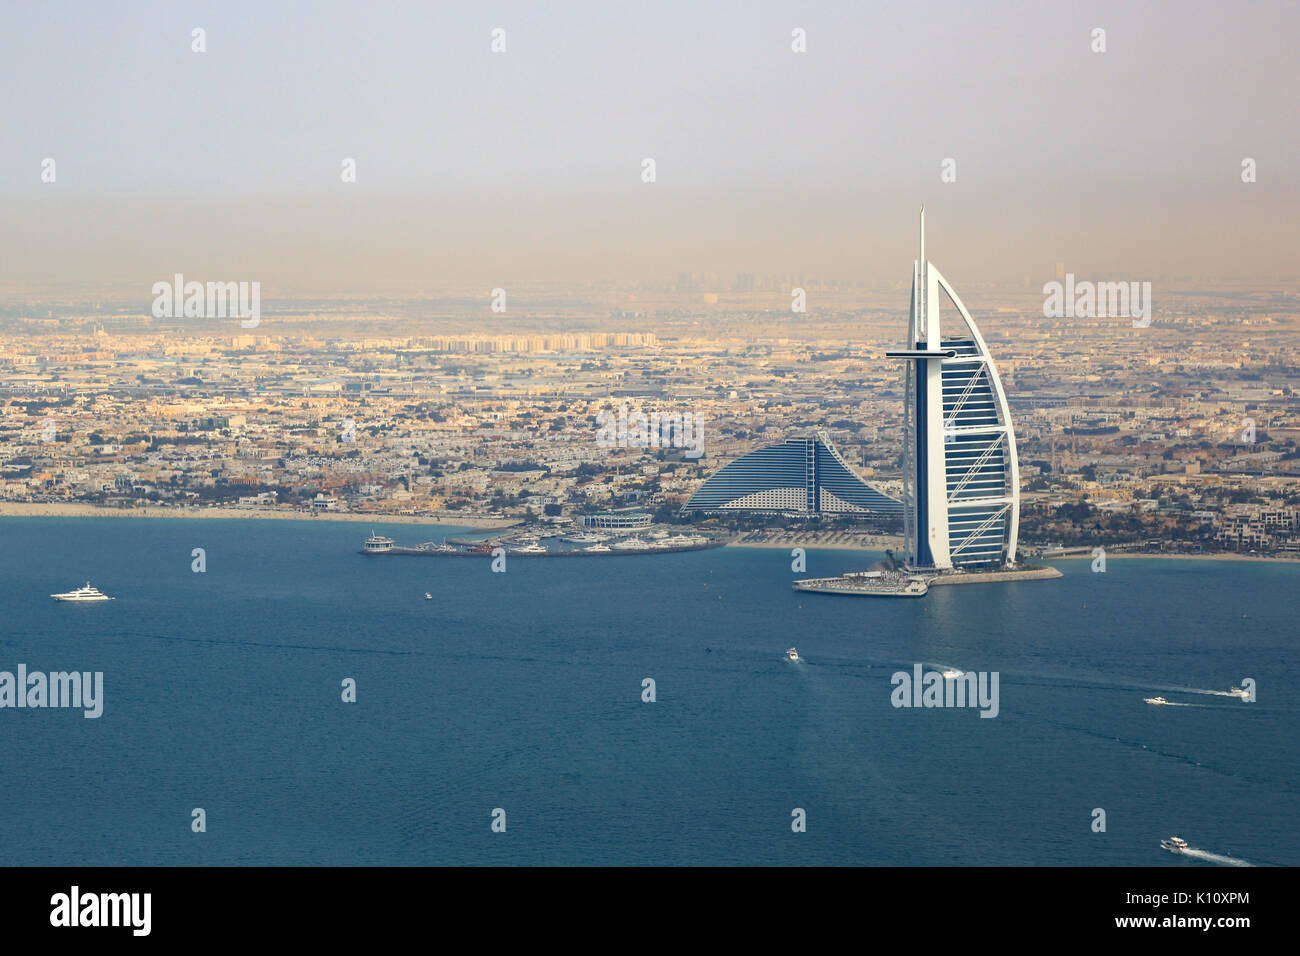 El burj al arab hotel dubai playa mar vista aérea fotografía eau Foto de stock